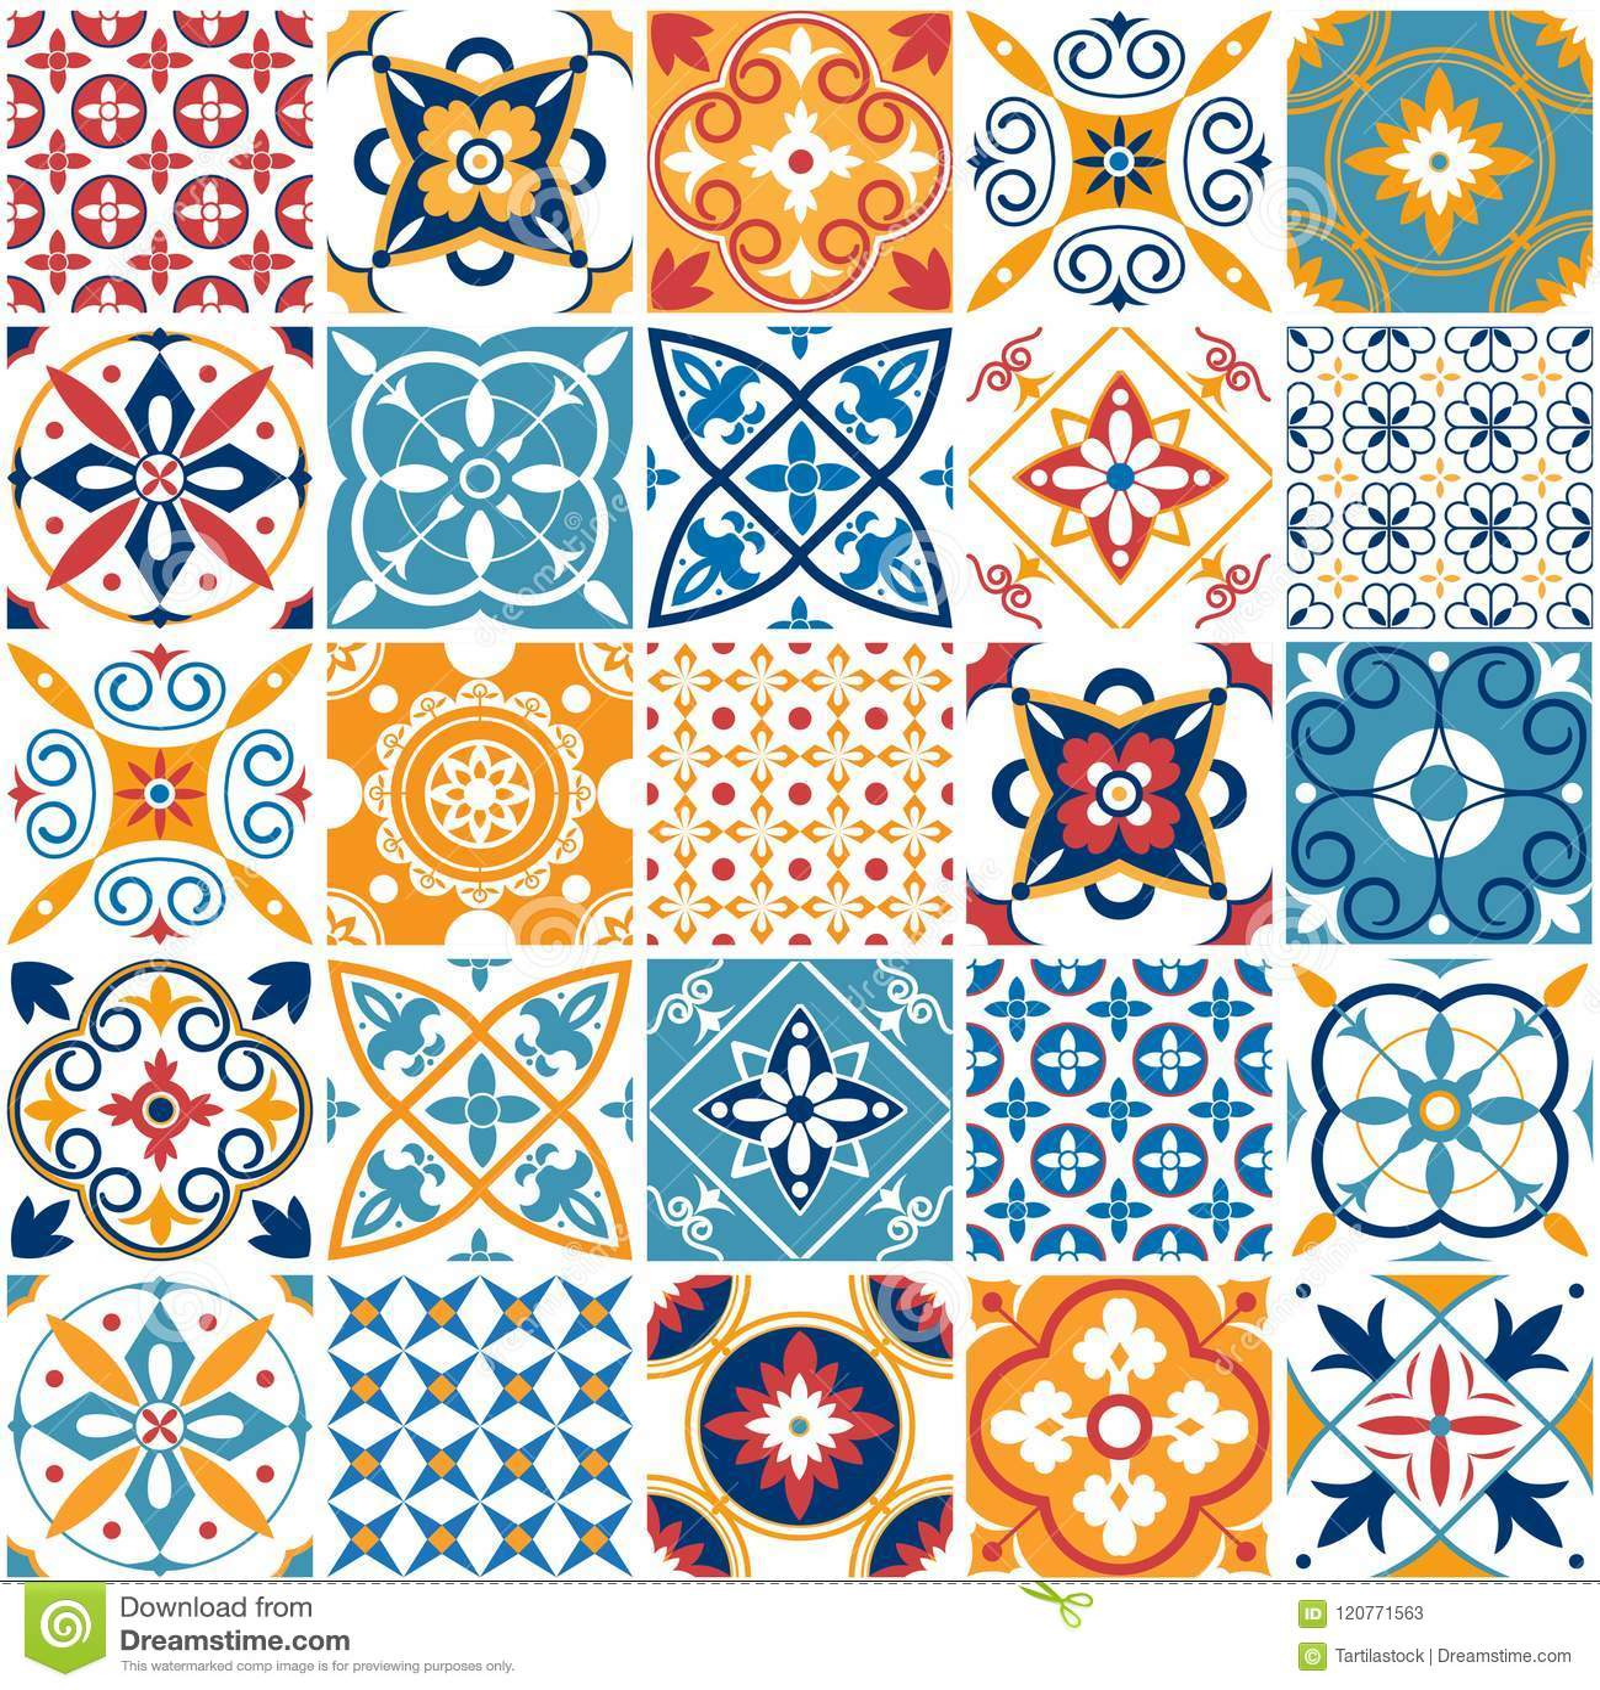 Designer White Abstract Ceramic Wall Tile Pack Of 8 L: Portugal Seamless Pattern. Vintage Mediterranean Ceramic